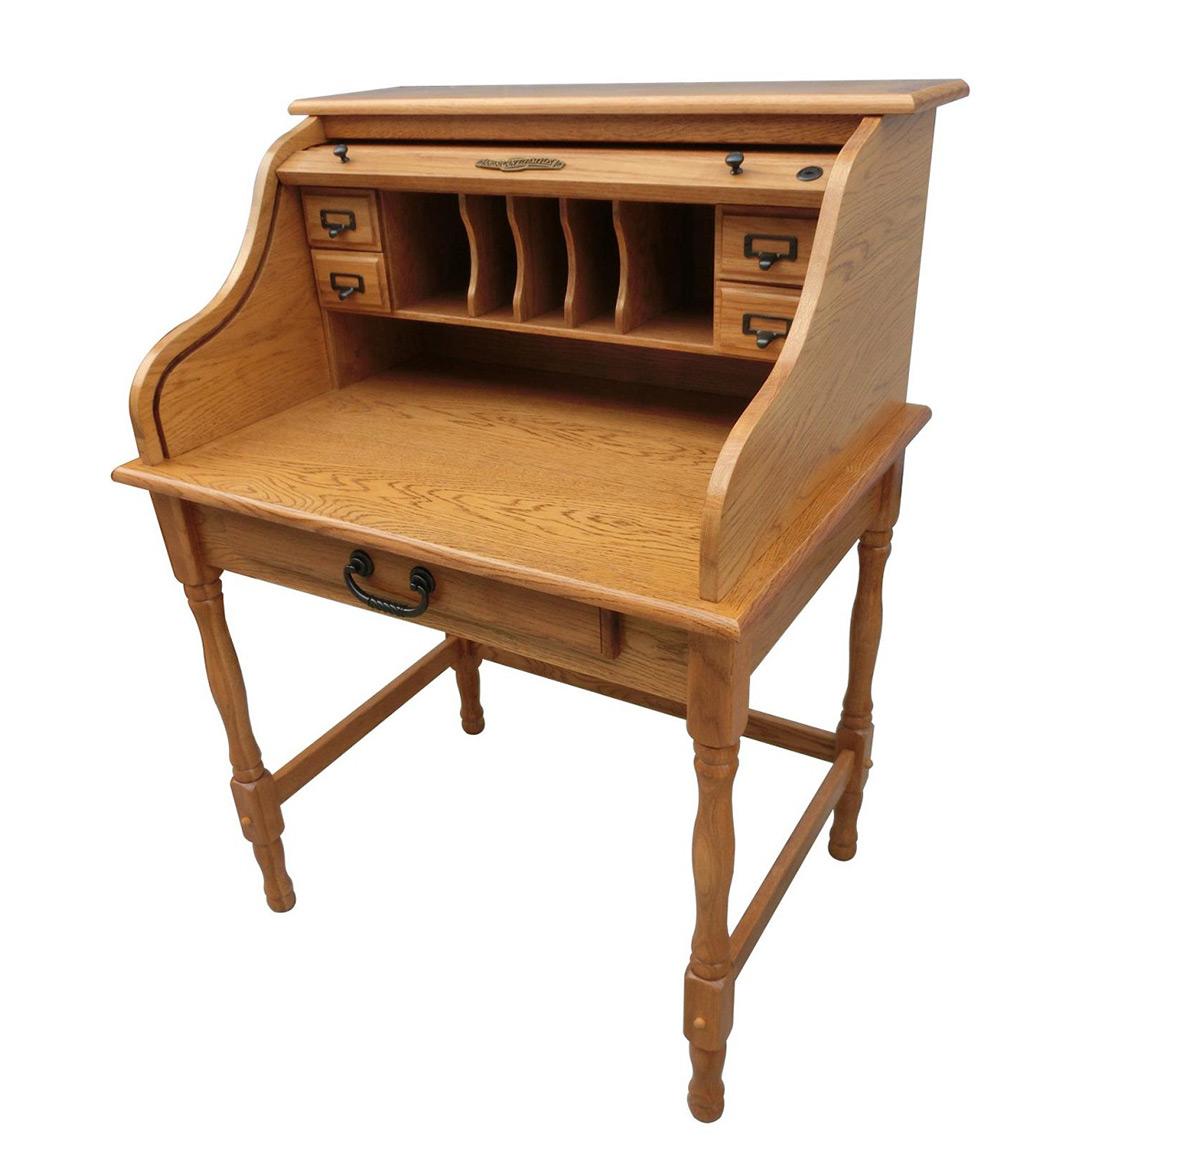 Chelsea Home Lonie 32-inch Mini Roll Top Desk - Harvest Oak